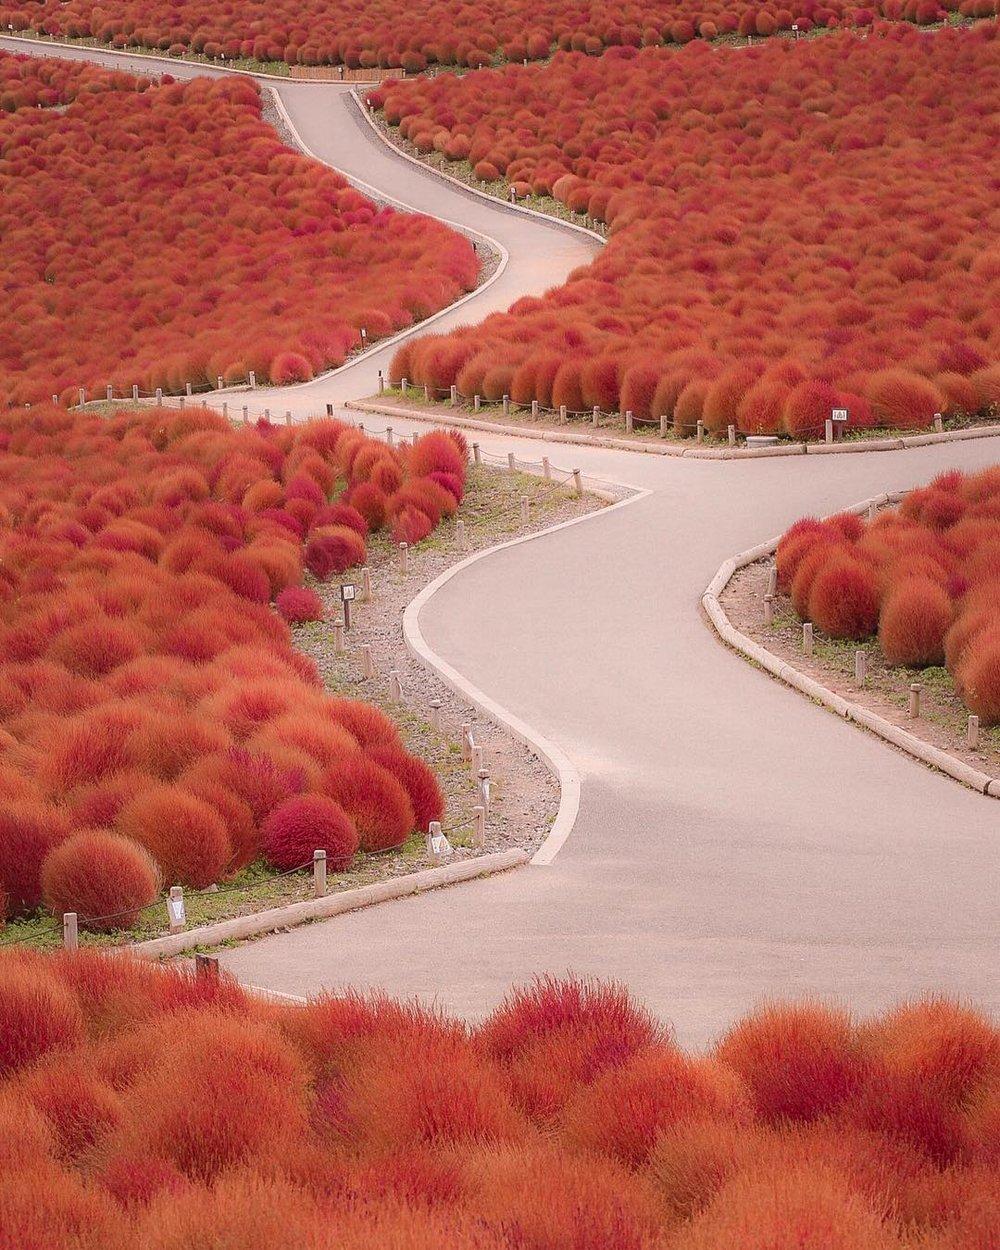 Ibaraki, Japan - taken by Takumi @tkm82_